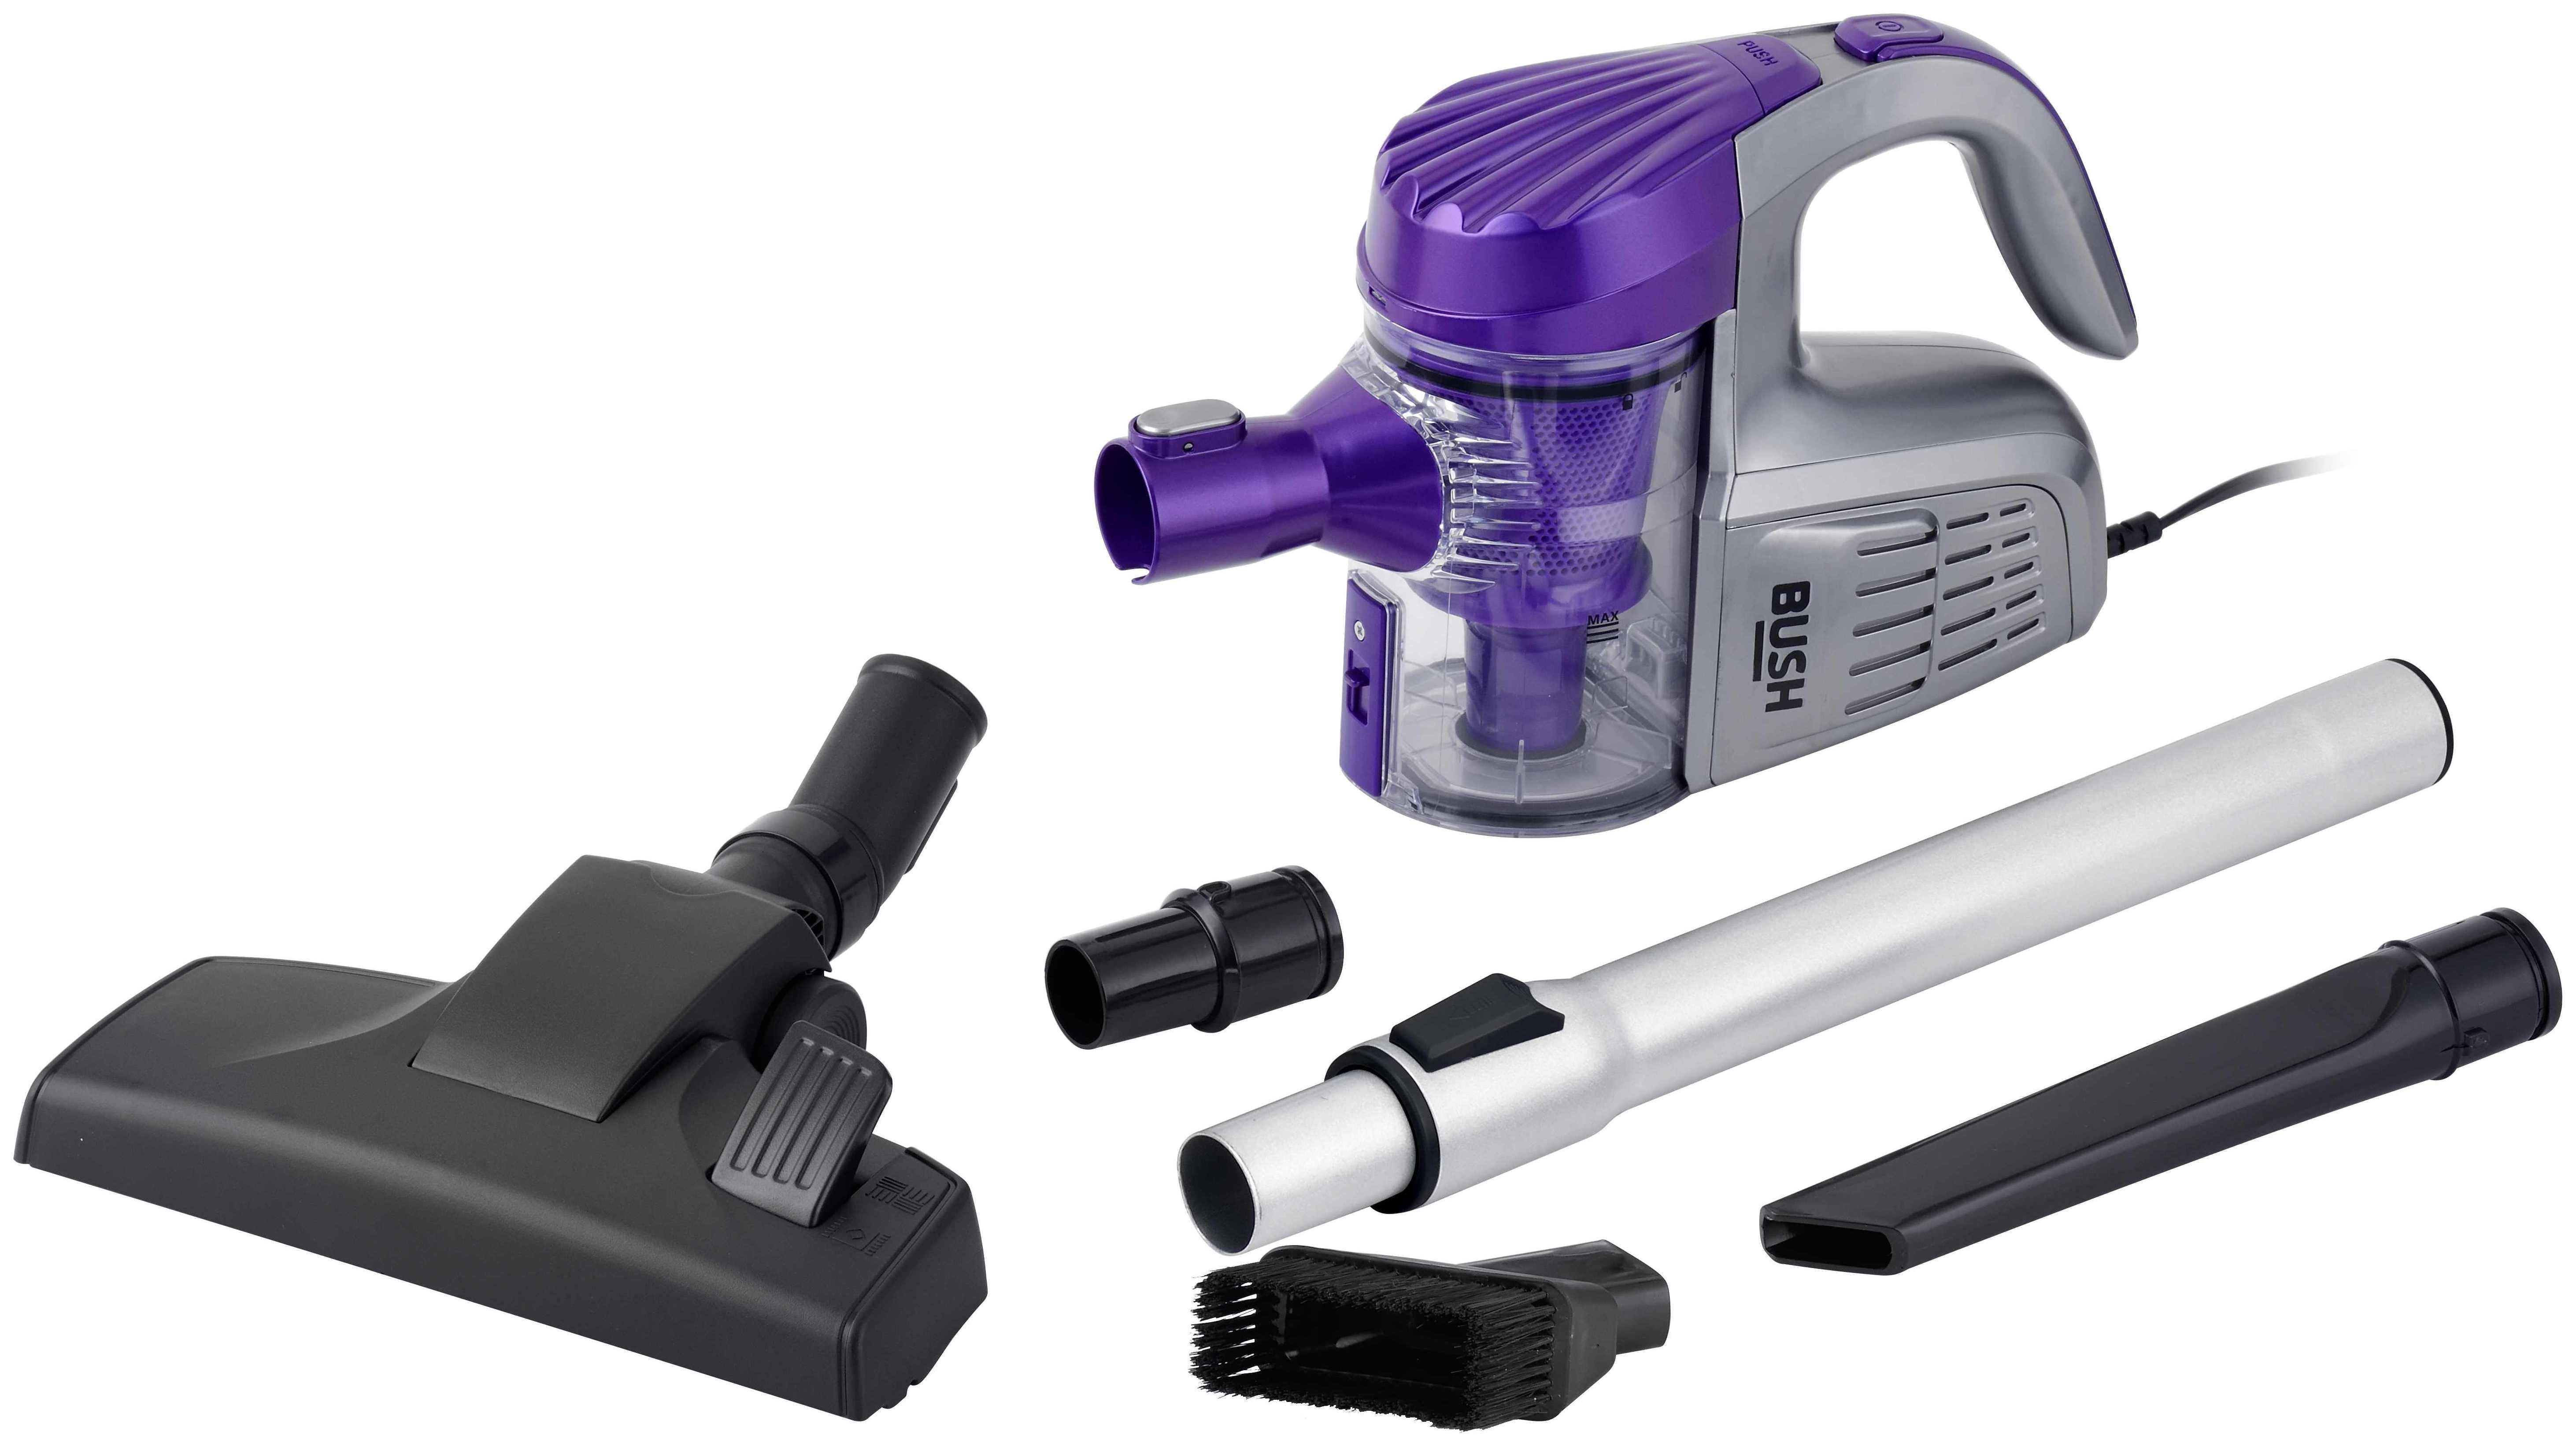 'Bush Lightweight - Bagless Upright - Vacuum Cleaner